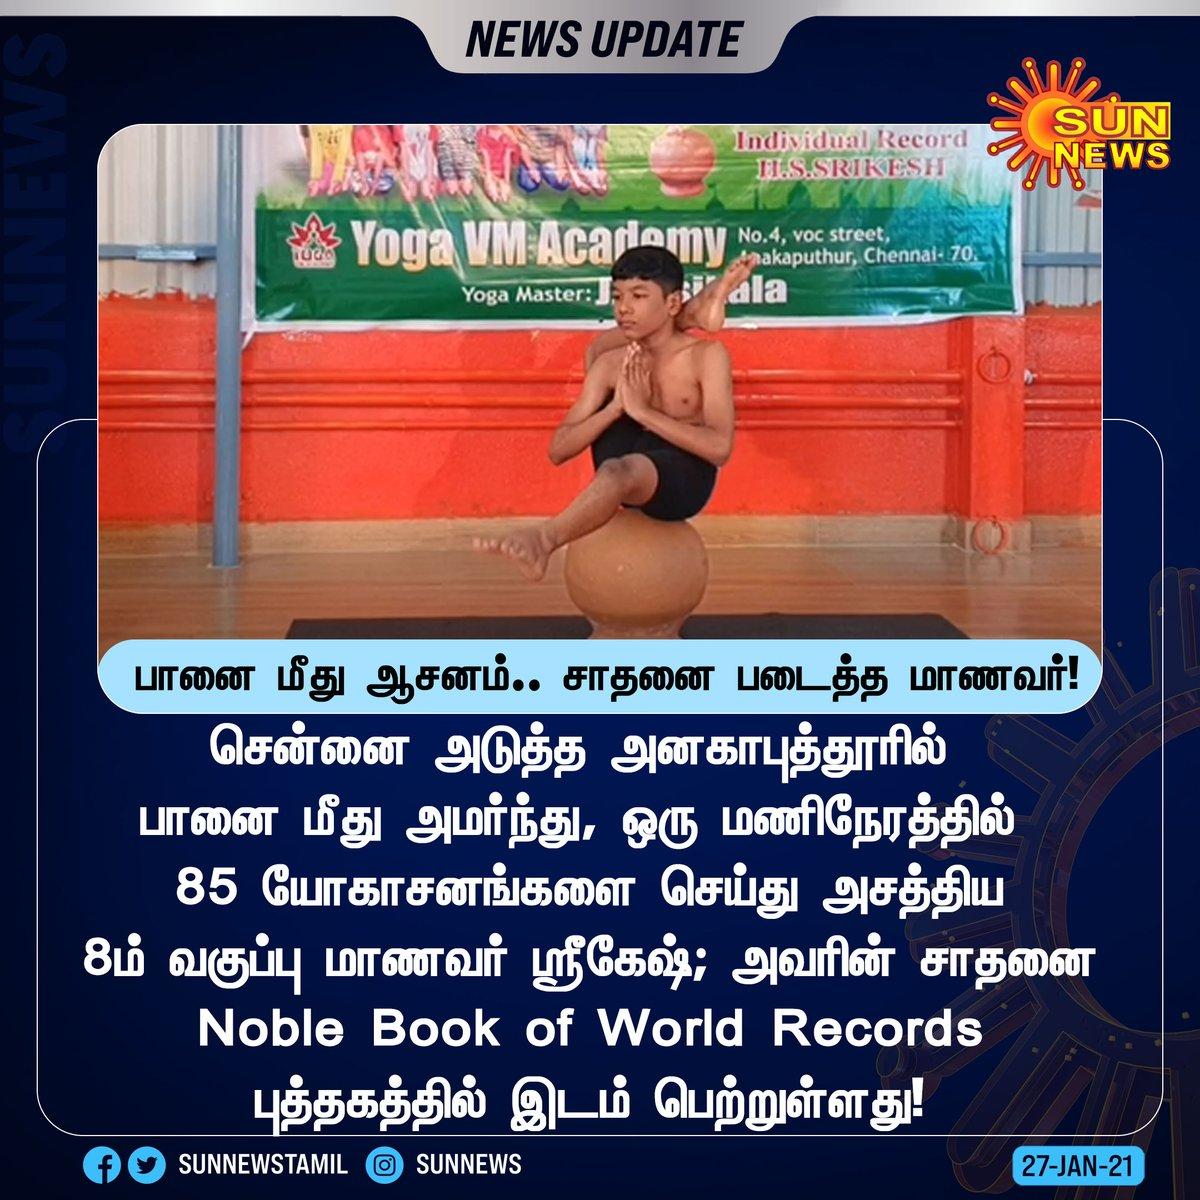 #NewsUpdate | பானை மீது ஆசனம்.. சாதனை படைத்த 8ம் வகுப்பு மாணவர்!    #Sunnews | #Yoga | #Chennai